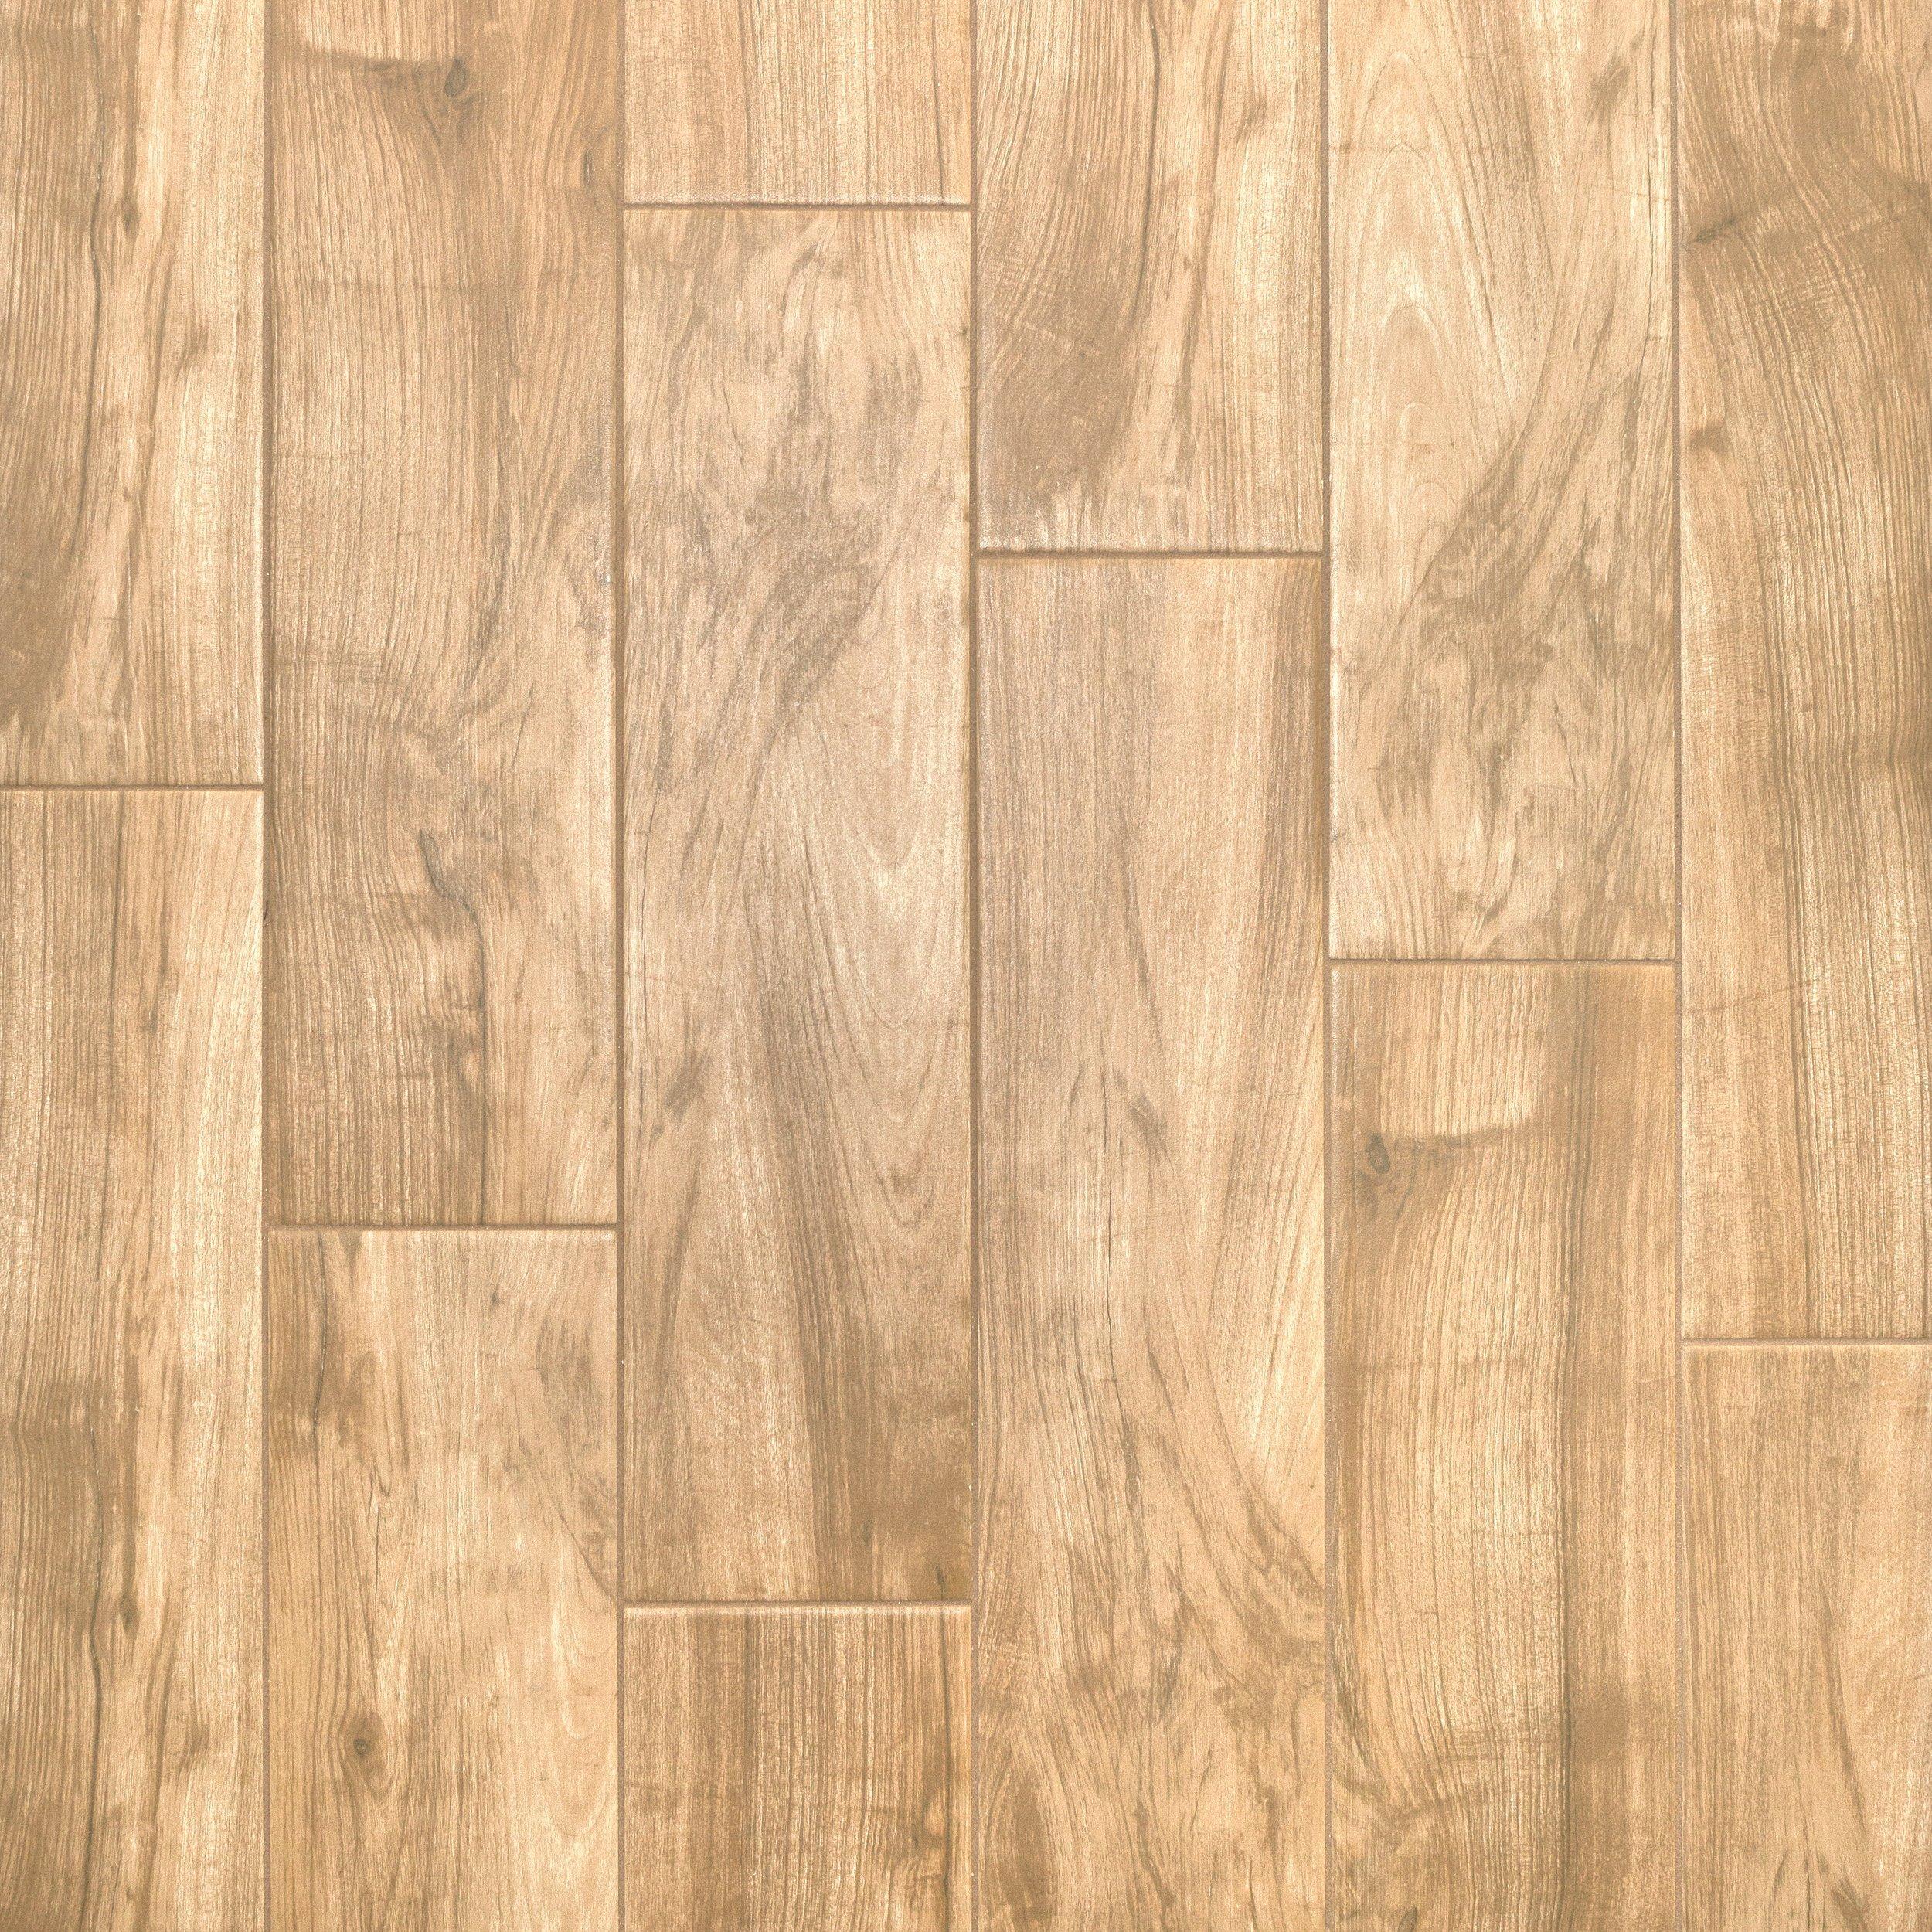 Prospect Ridge Wood Plank Porcelain Tile   6 X 24   100294867 | Floor And  Decor